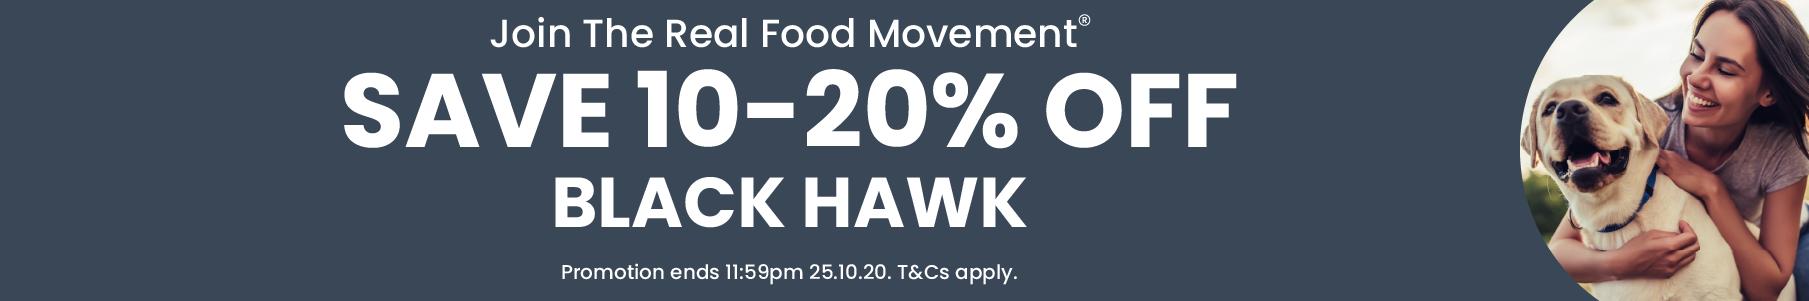 black-hawk-category-banner.png